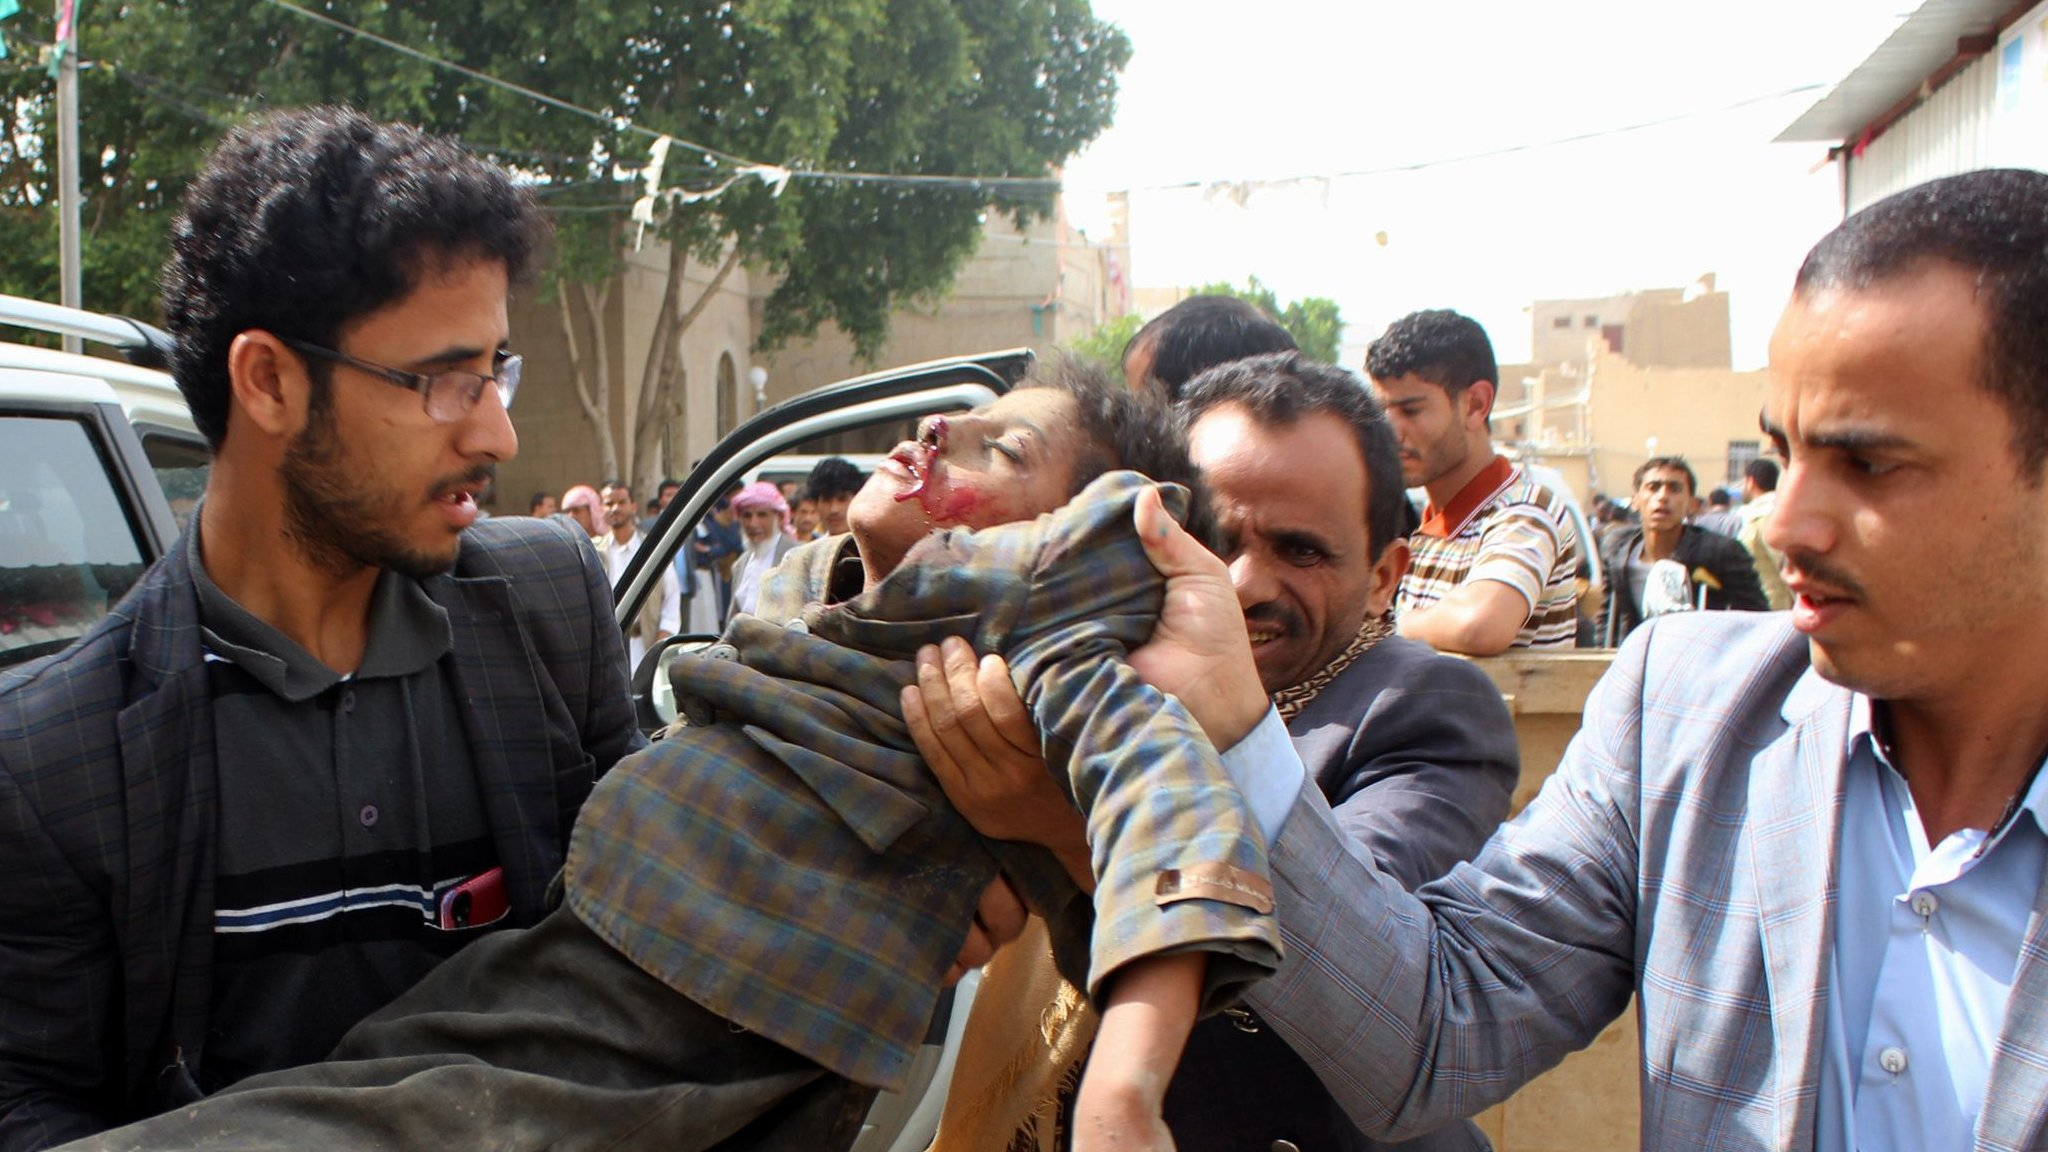 Saudi-led air strike kills 29 children in Yemen